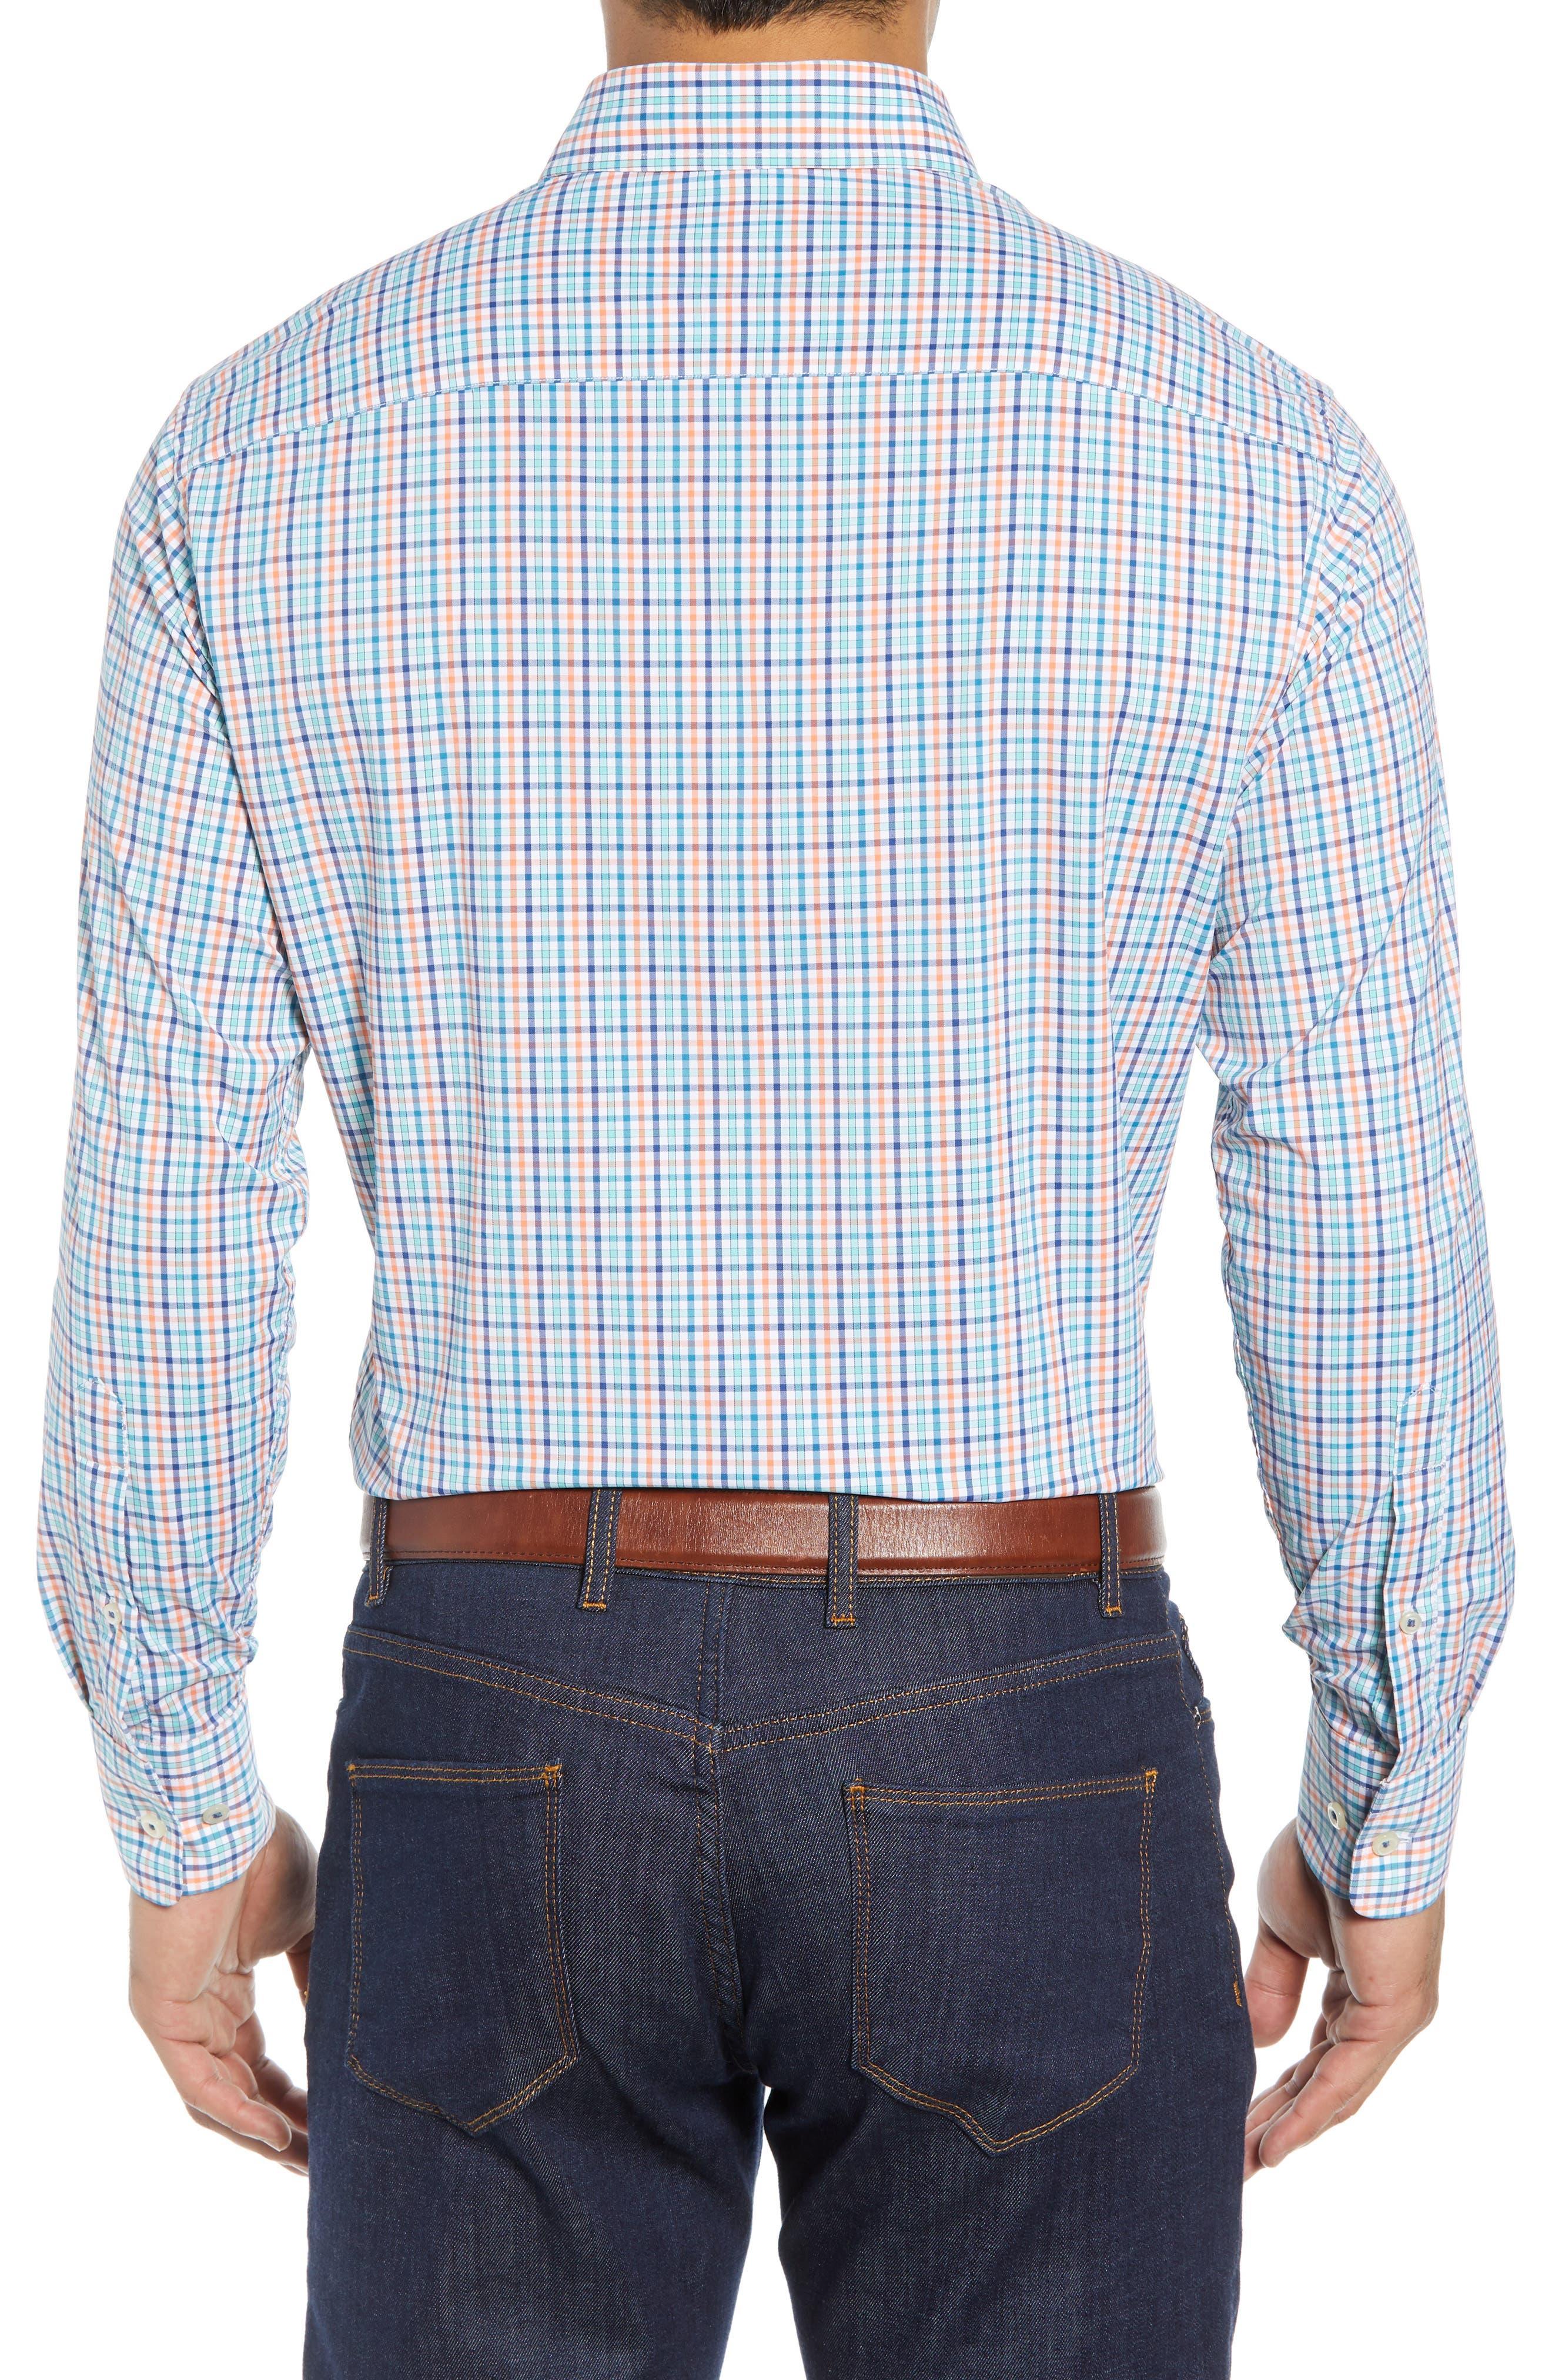 Lawson Regular Fit Tattersall Check Performance Sport Shirt,                             Alternate thumbnail 3, color,                             BLUE